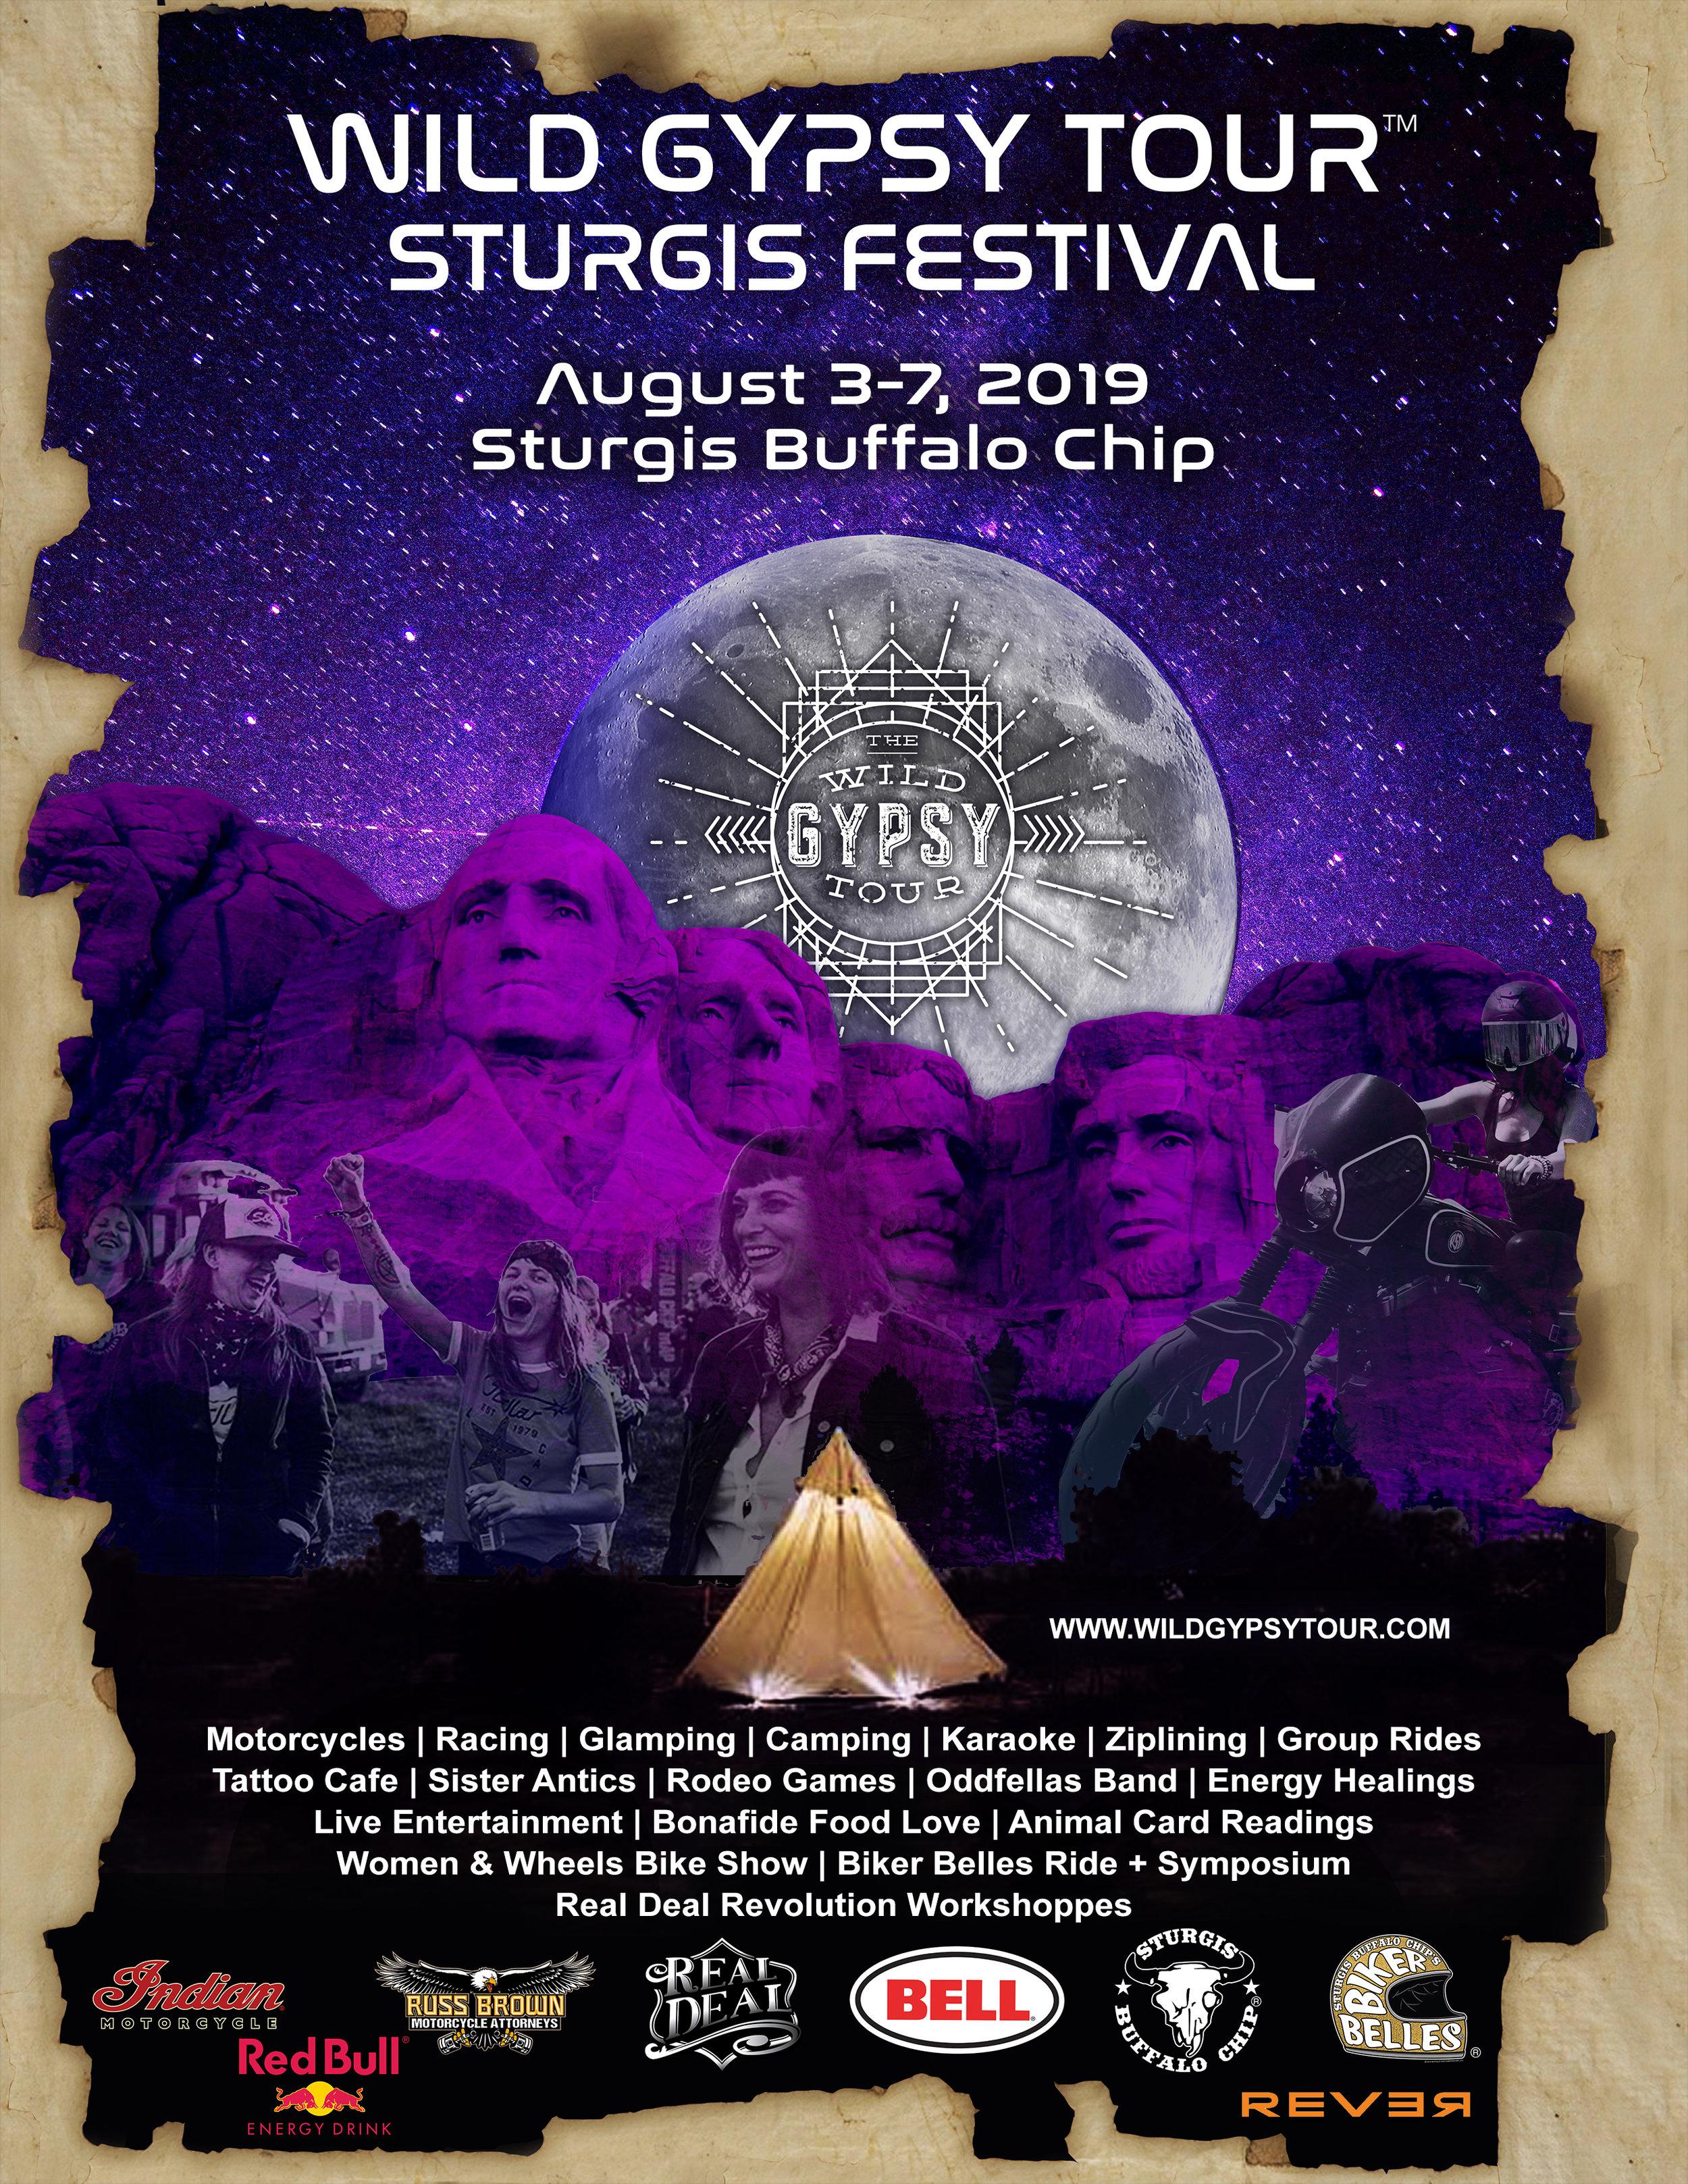 Wild-Gypsy-Tour-Sturgis-Buffalo-Chip-Poster.jpg